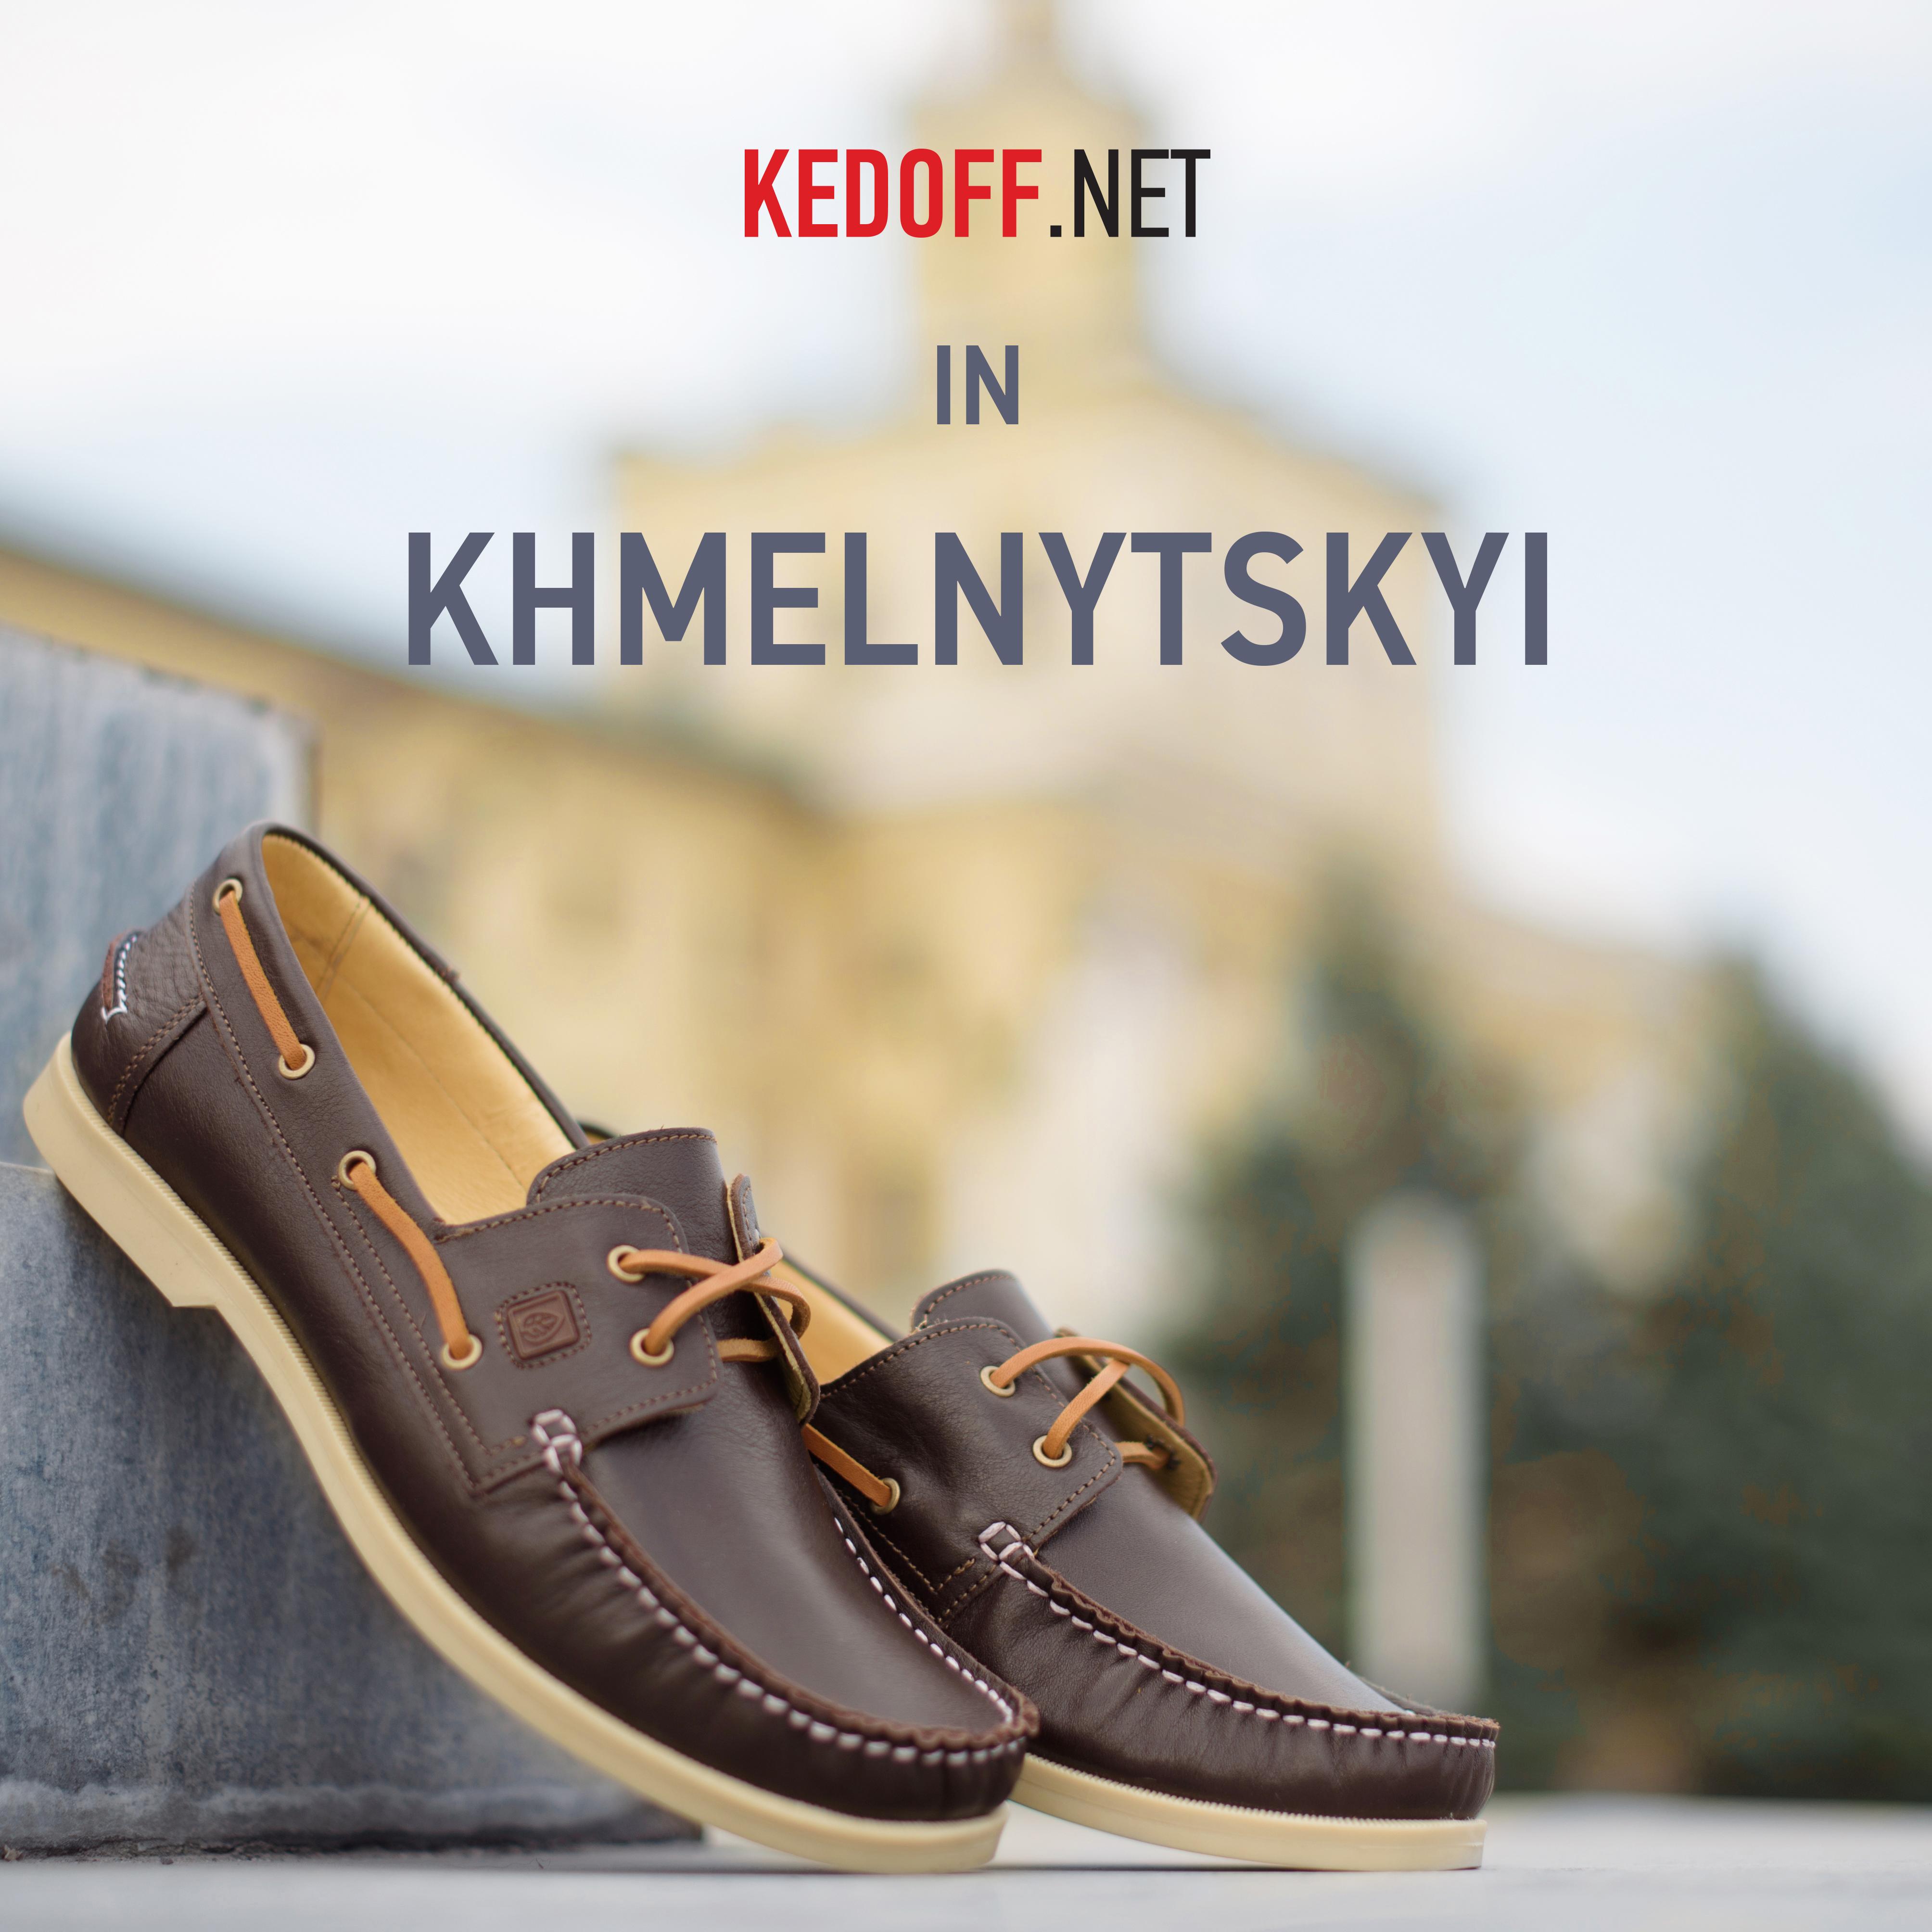 интернет магазин обуви Kedoff.net Хмельницкий